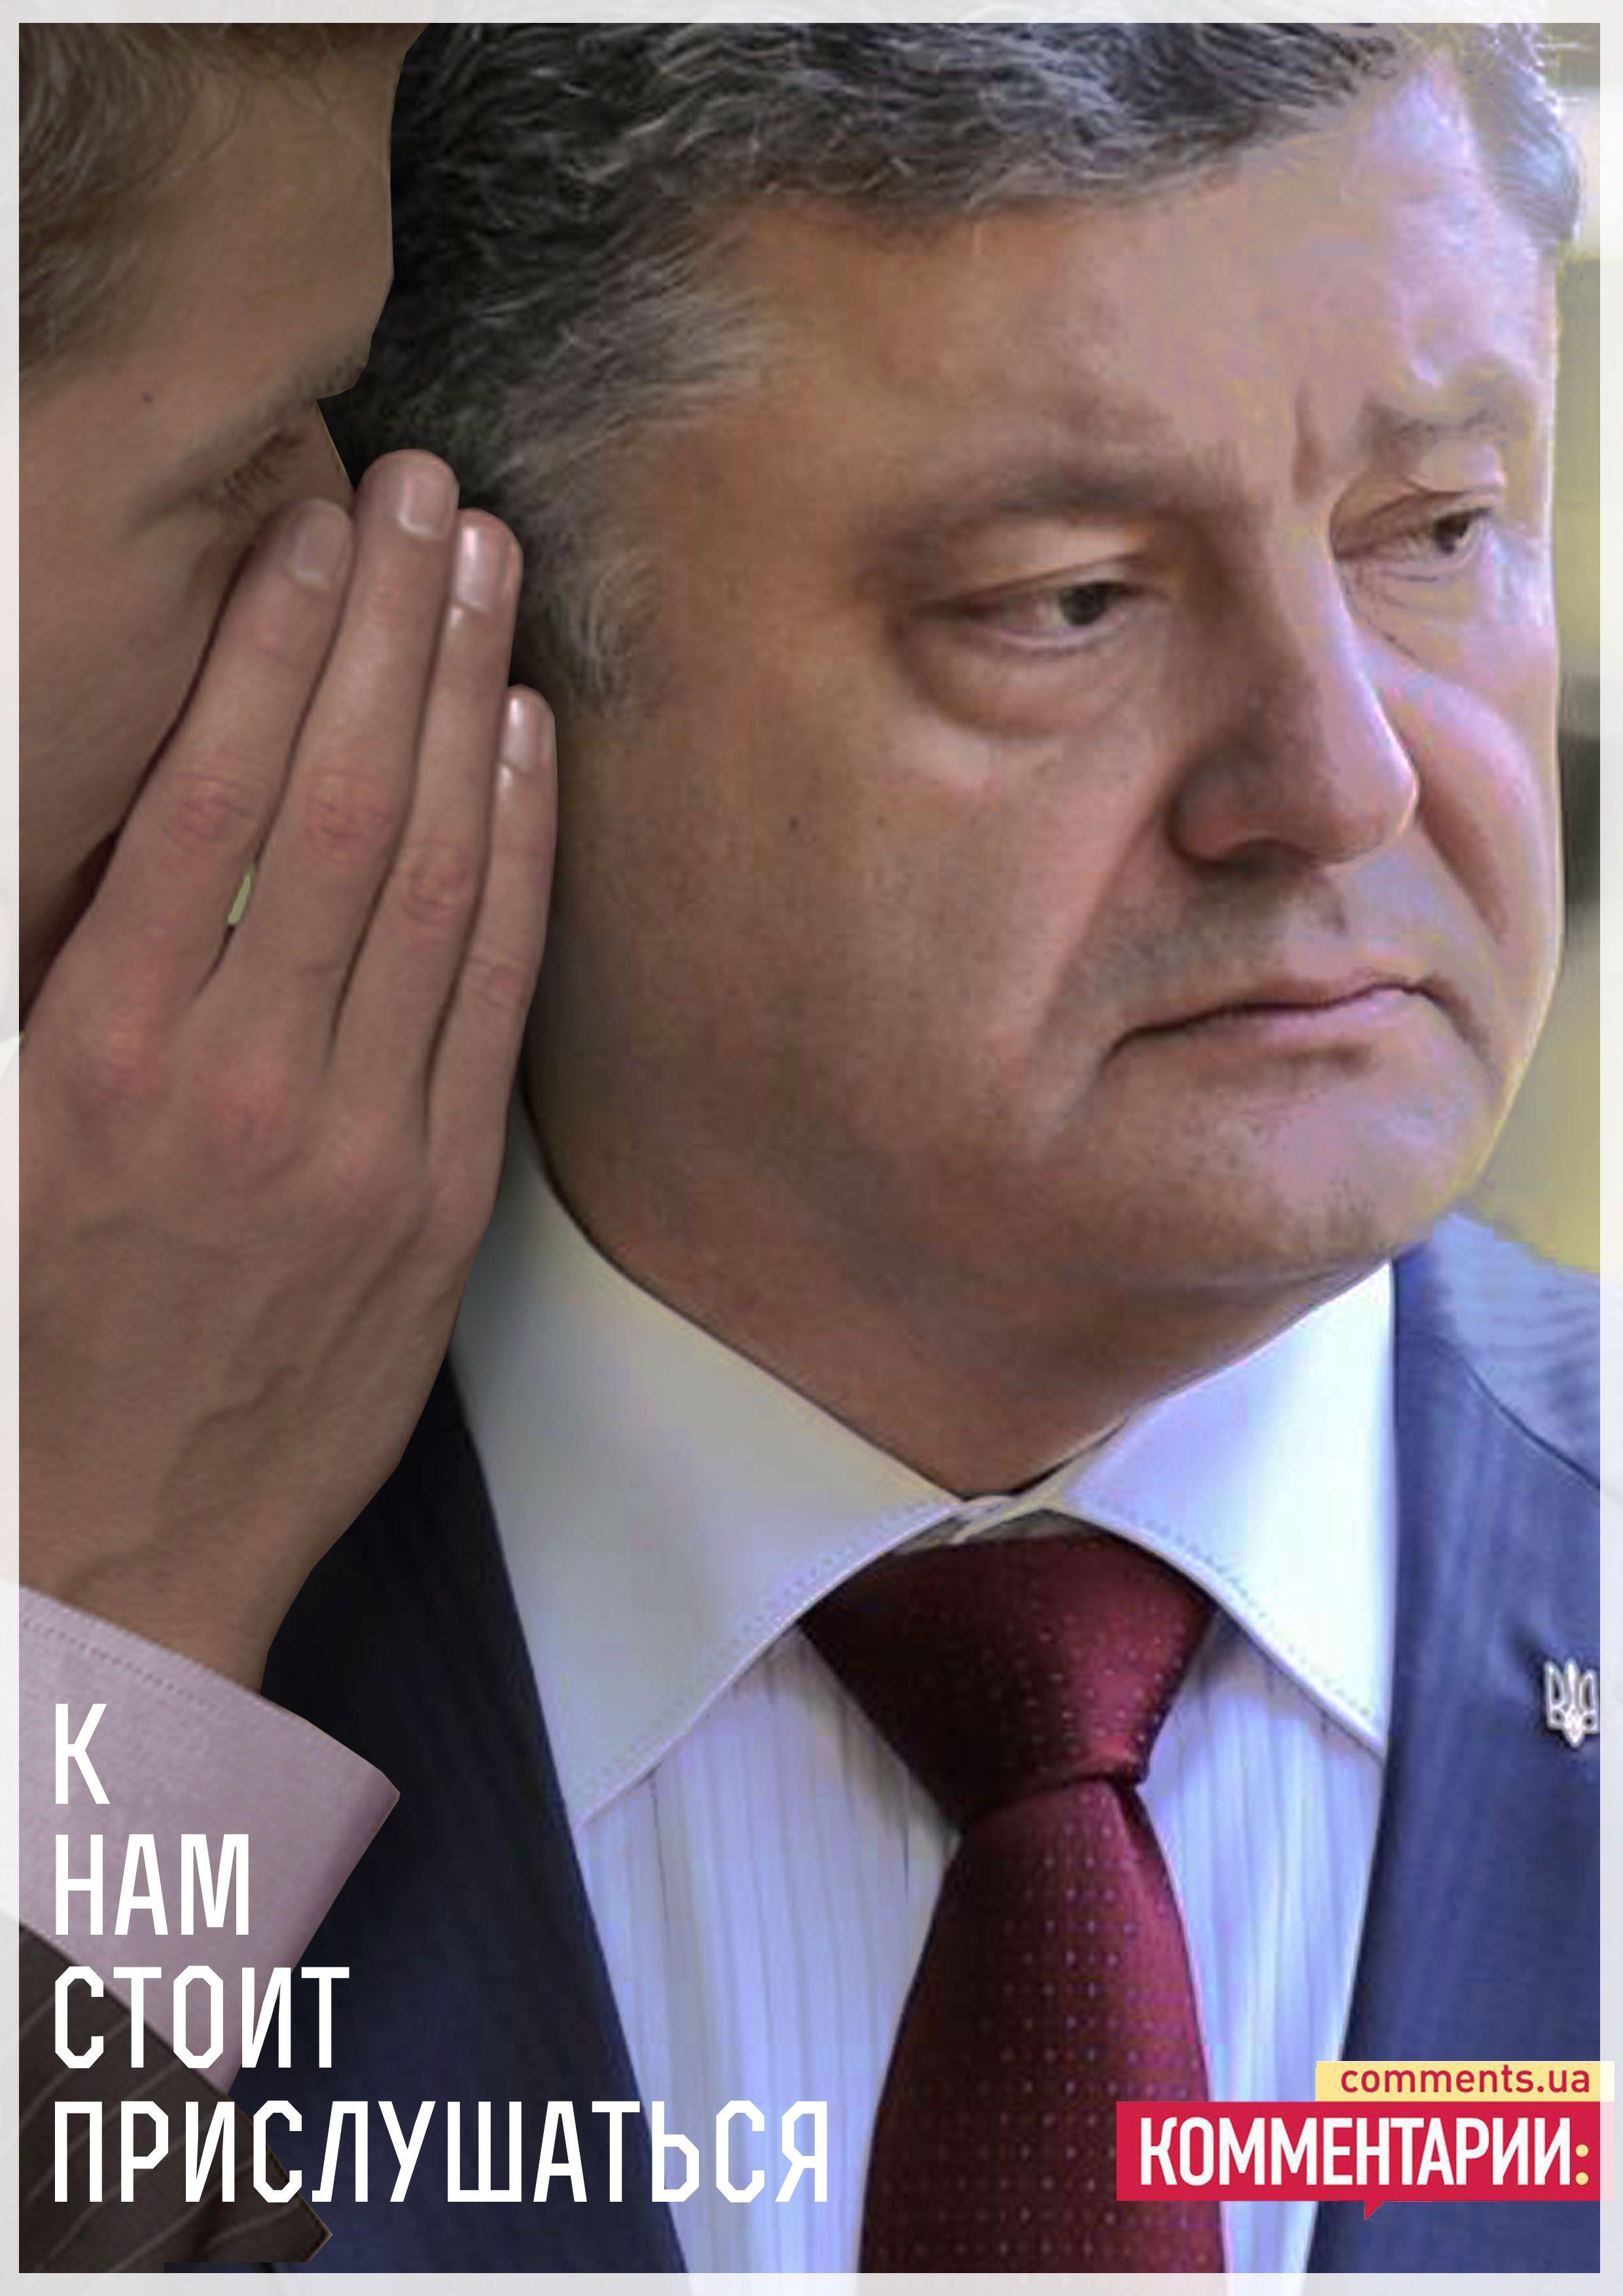 #CommentsUA #Ukraine #Creative #Ad #News